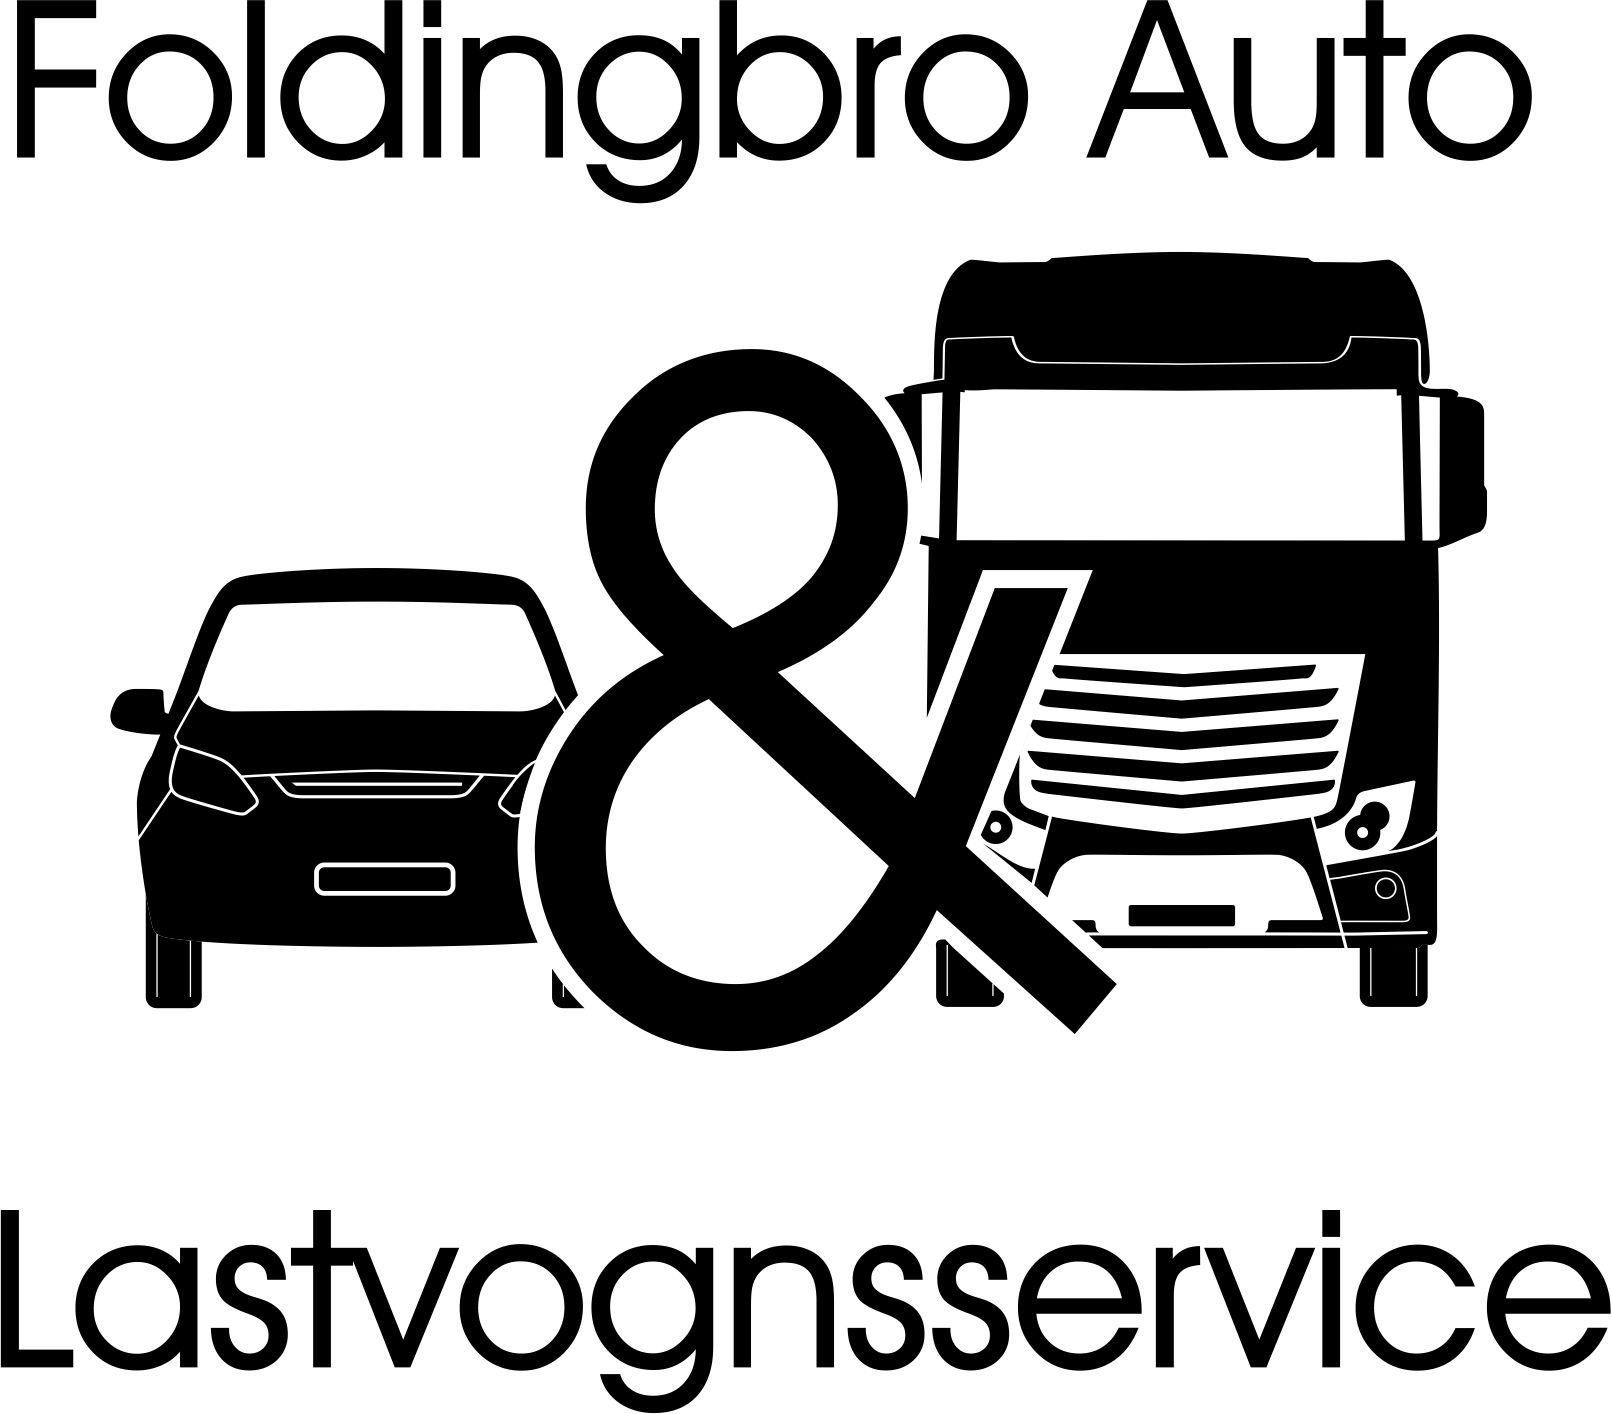 Foldingbro Auto og Lastvognsservice  logo